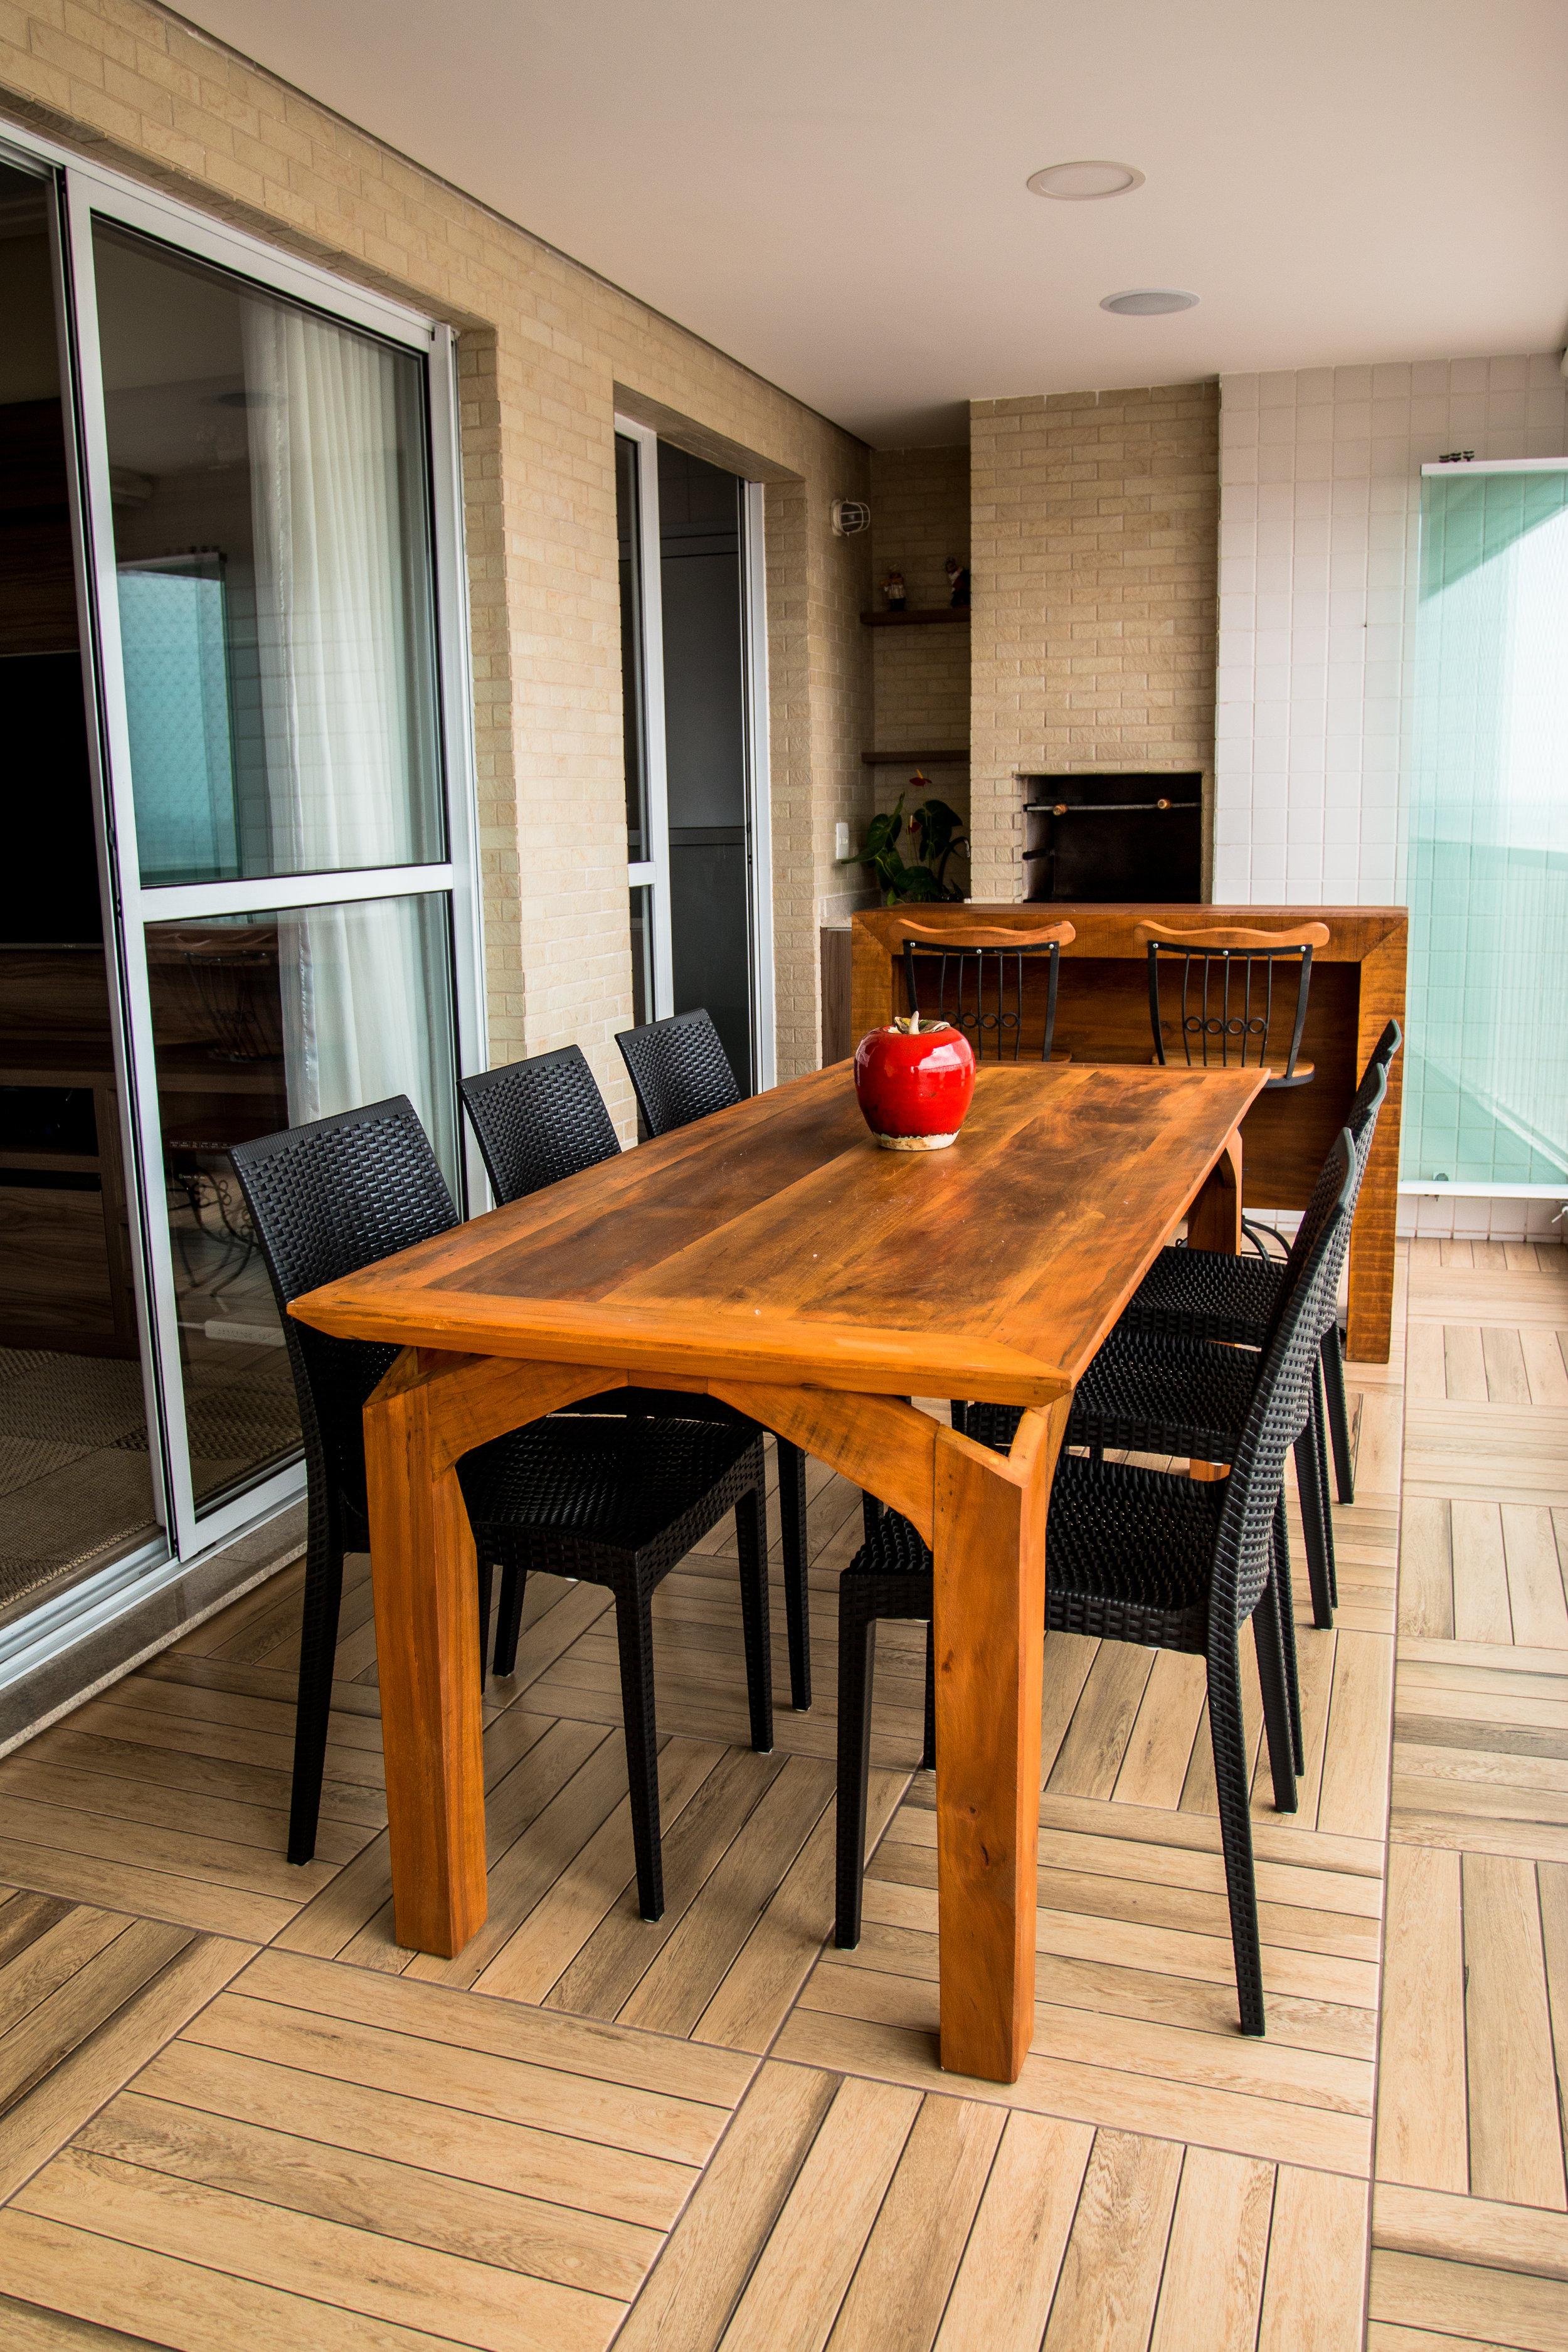 Varanda Gourmet com cadeira Ibiza preta 2.jpg